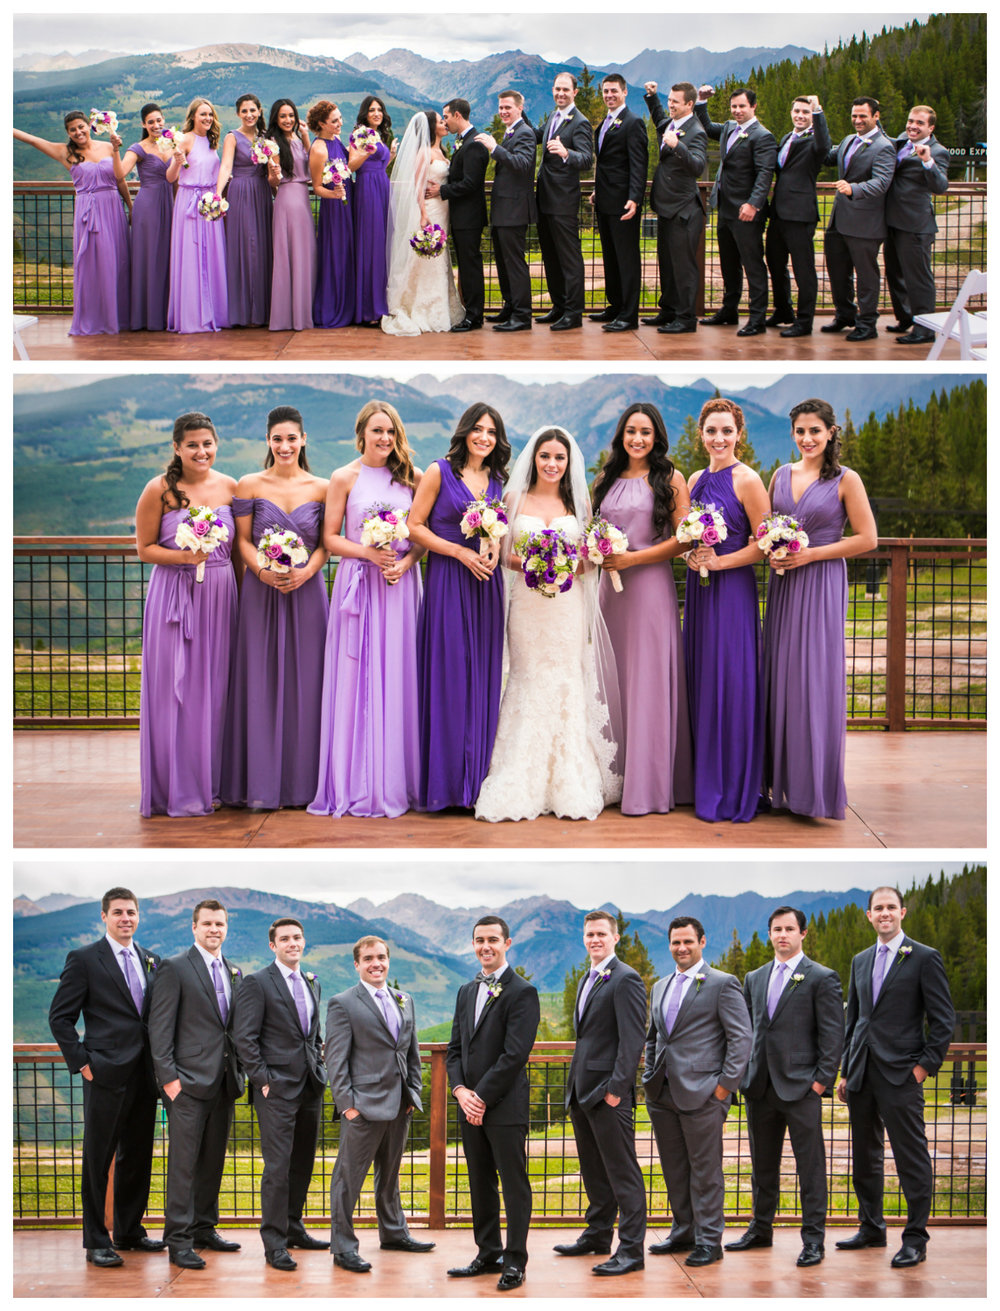 Bridal party.Vail Colorado Wedding photographed by JMGant Photography.